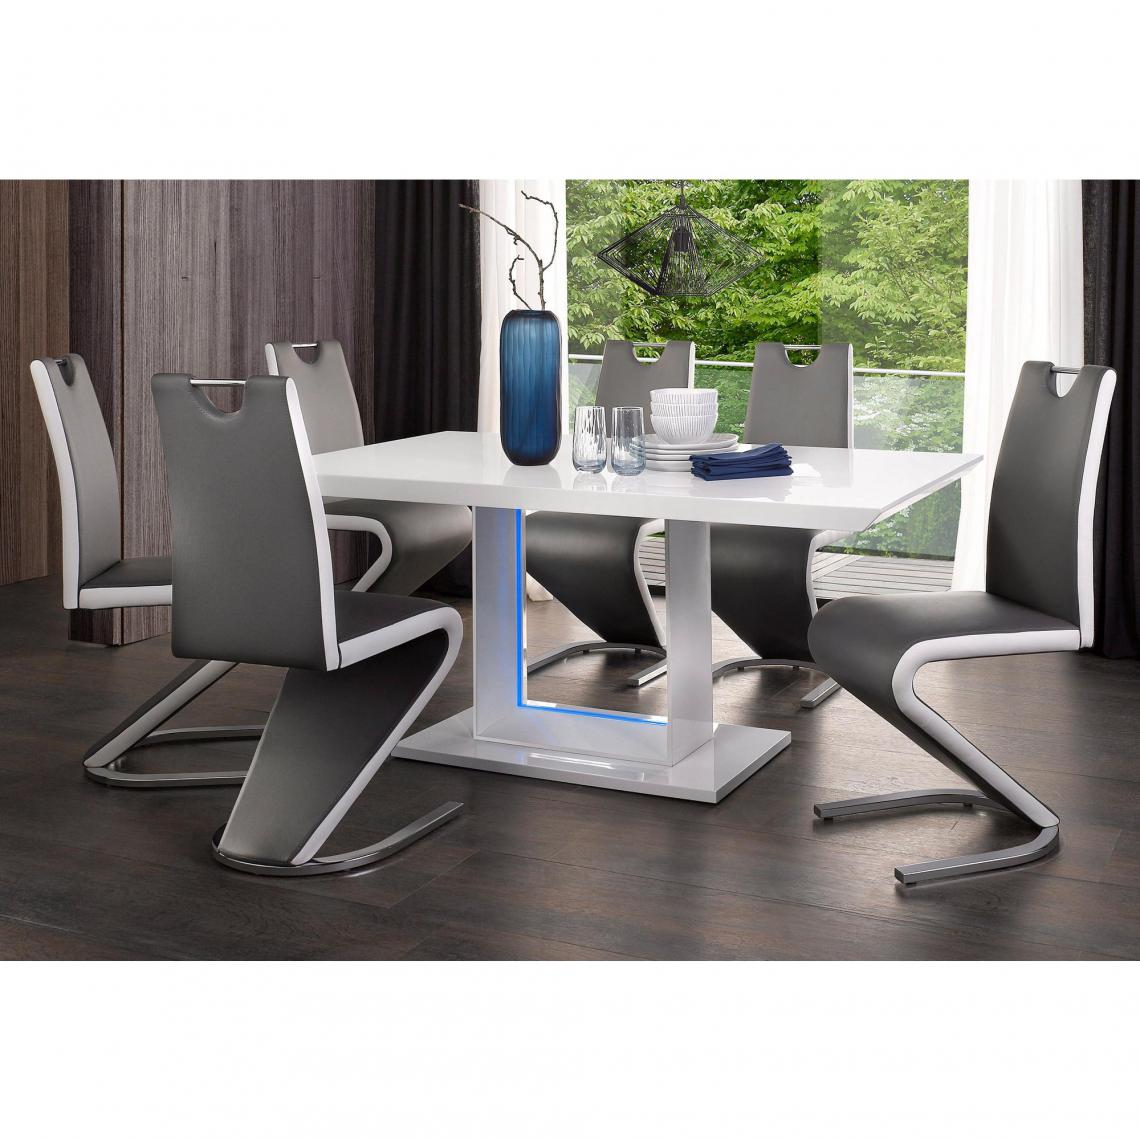 Table Salle A Manger Design Rectangulaire 6 Cou Avec Eage Led